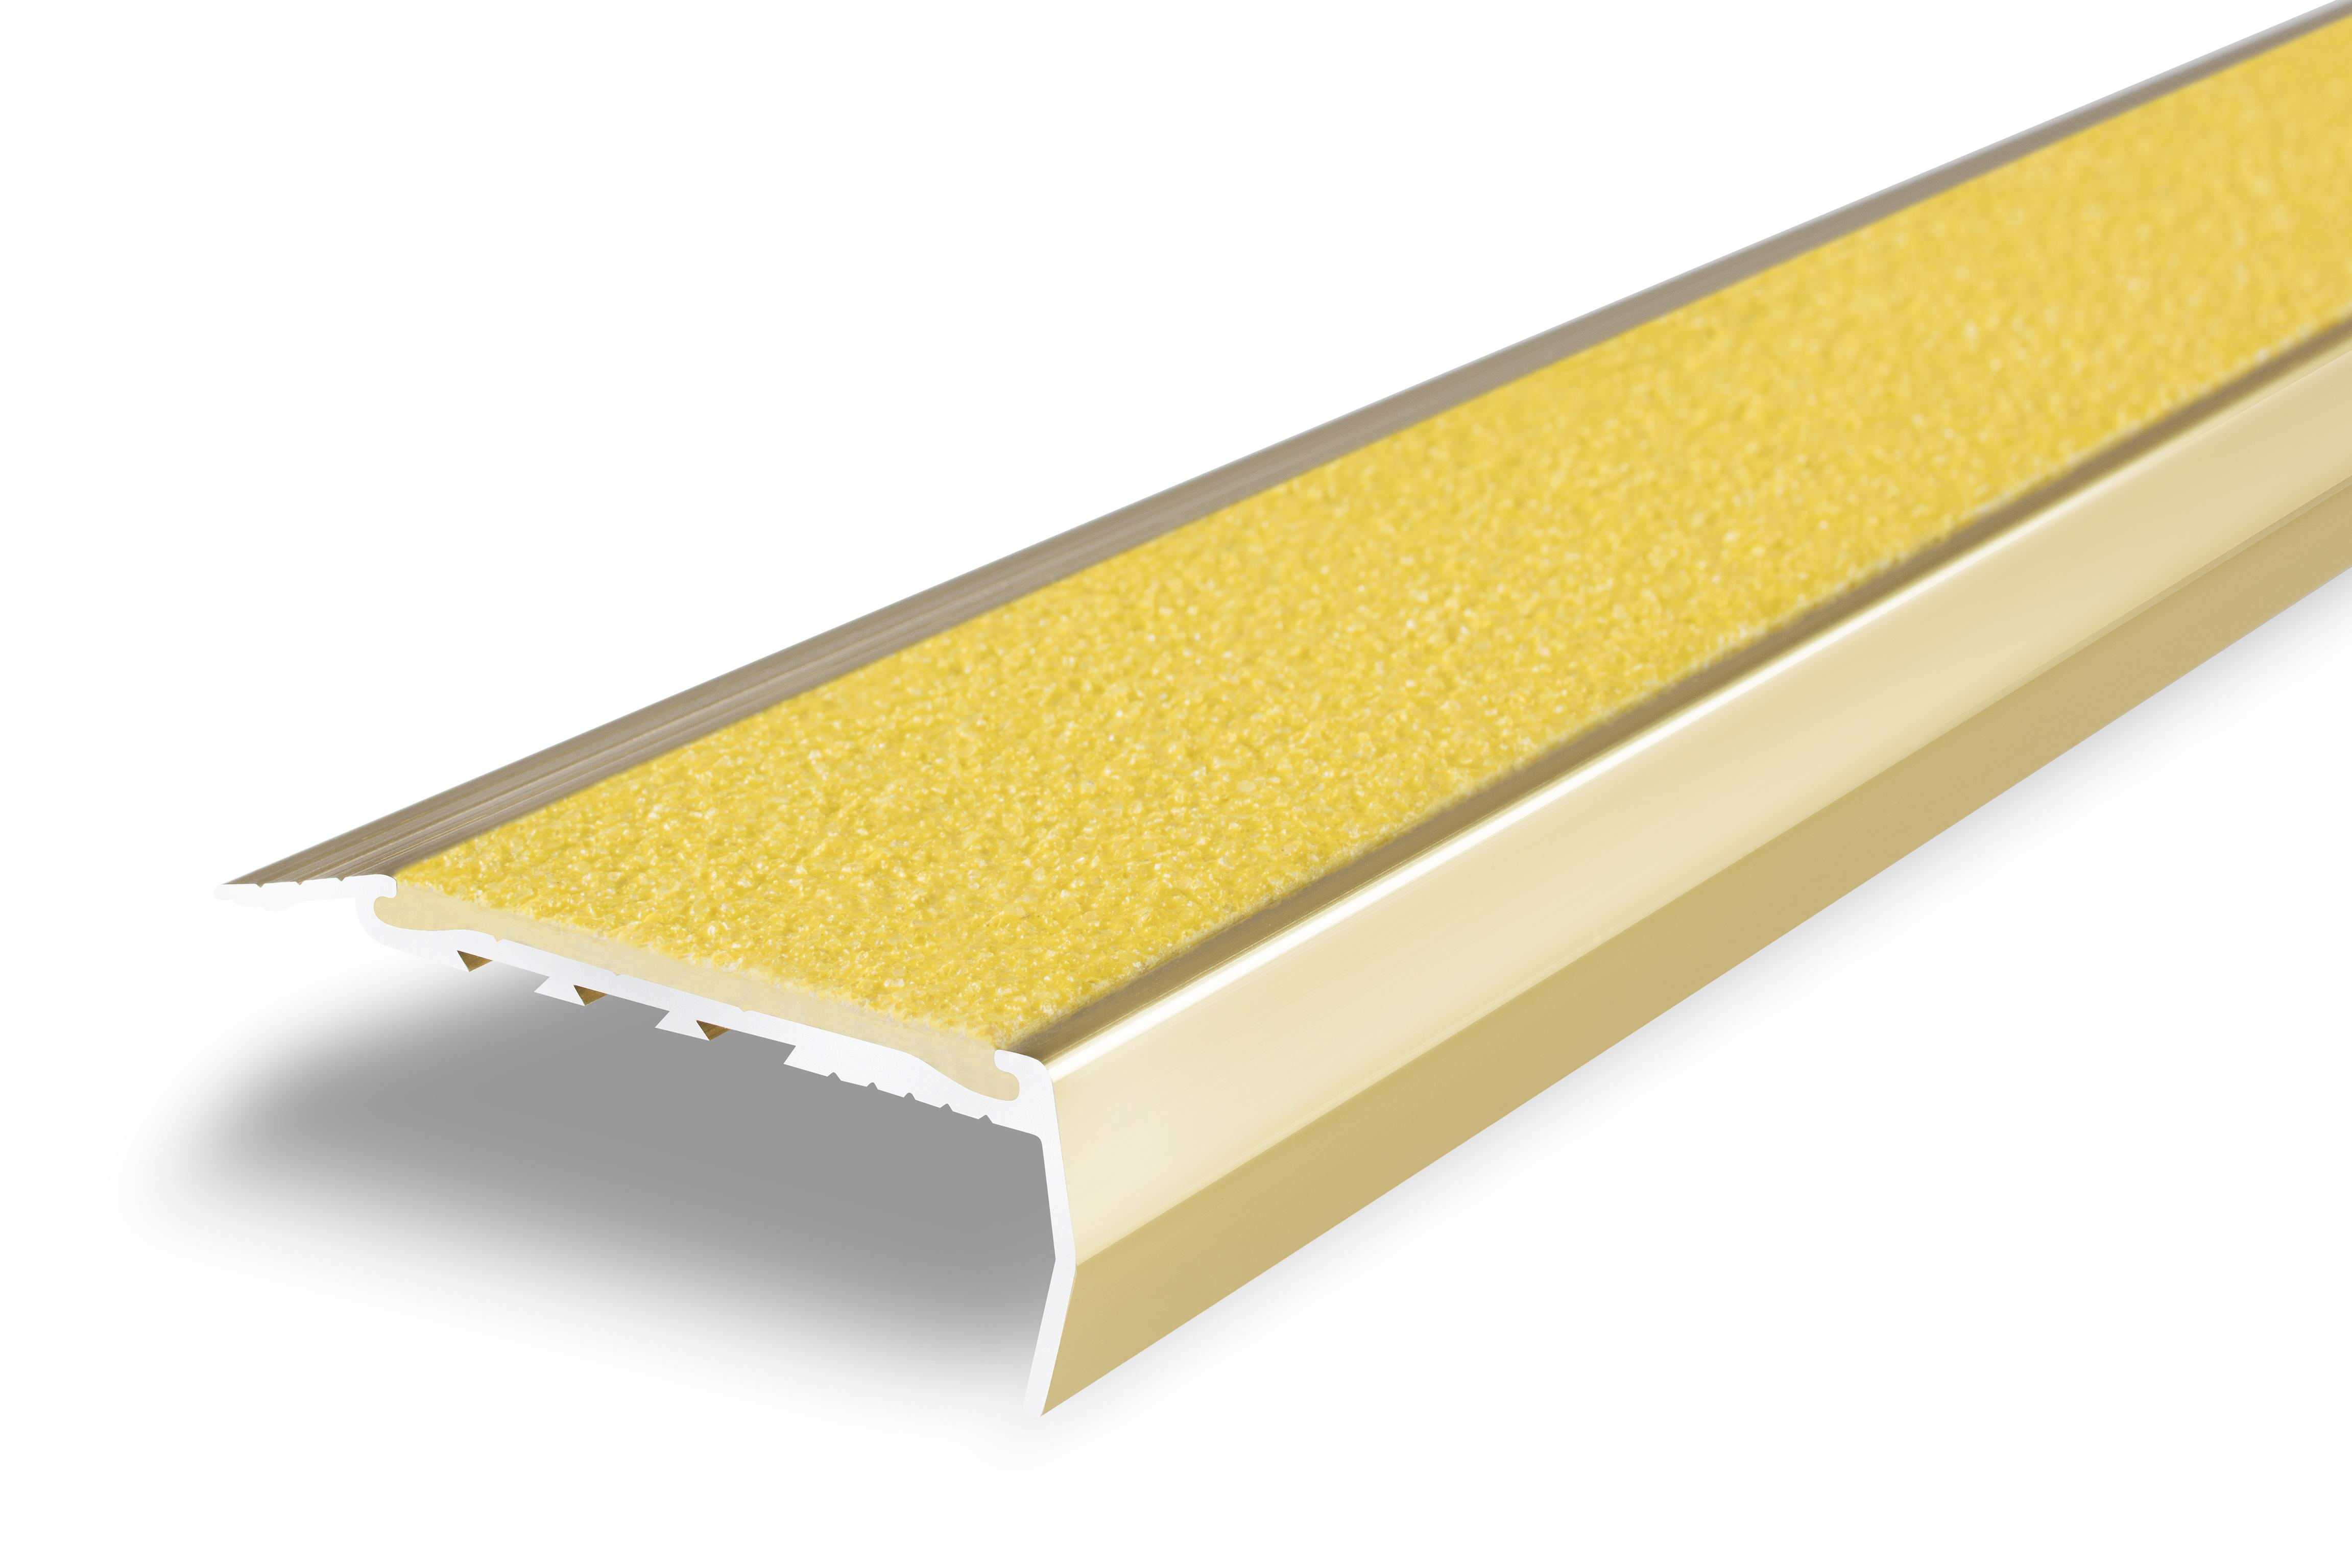 Dkr103 Tredfx Aluminium Stair Nosing